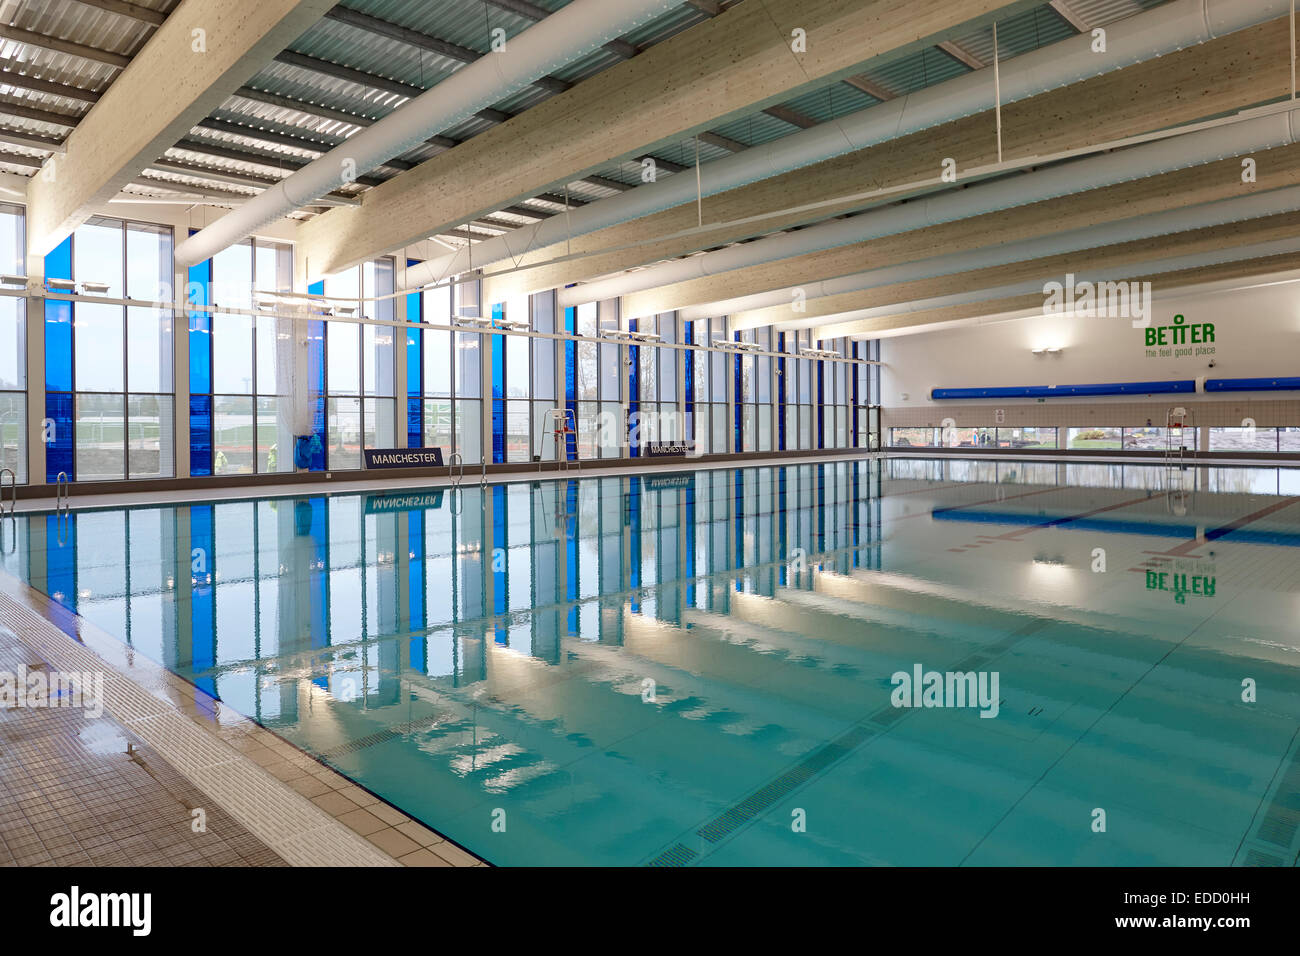 No Swimming Pool : Manchester beswick interior swimming pool no people stock